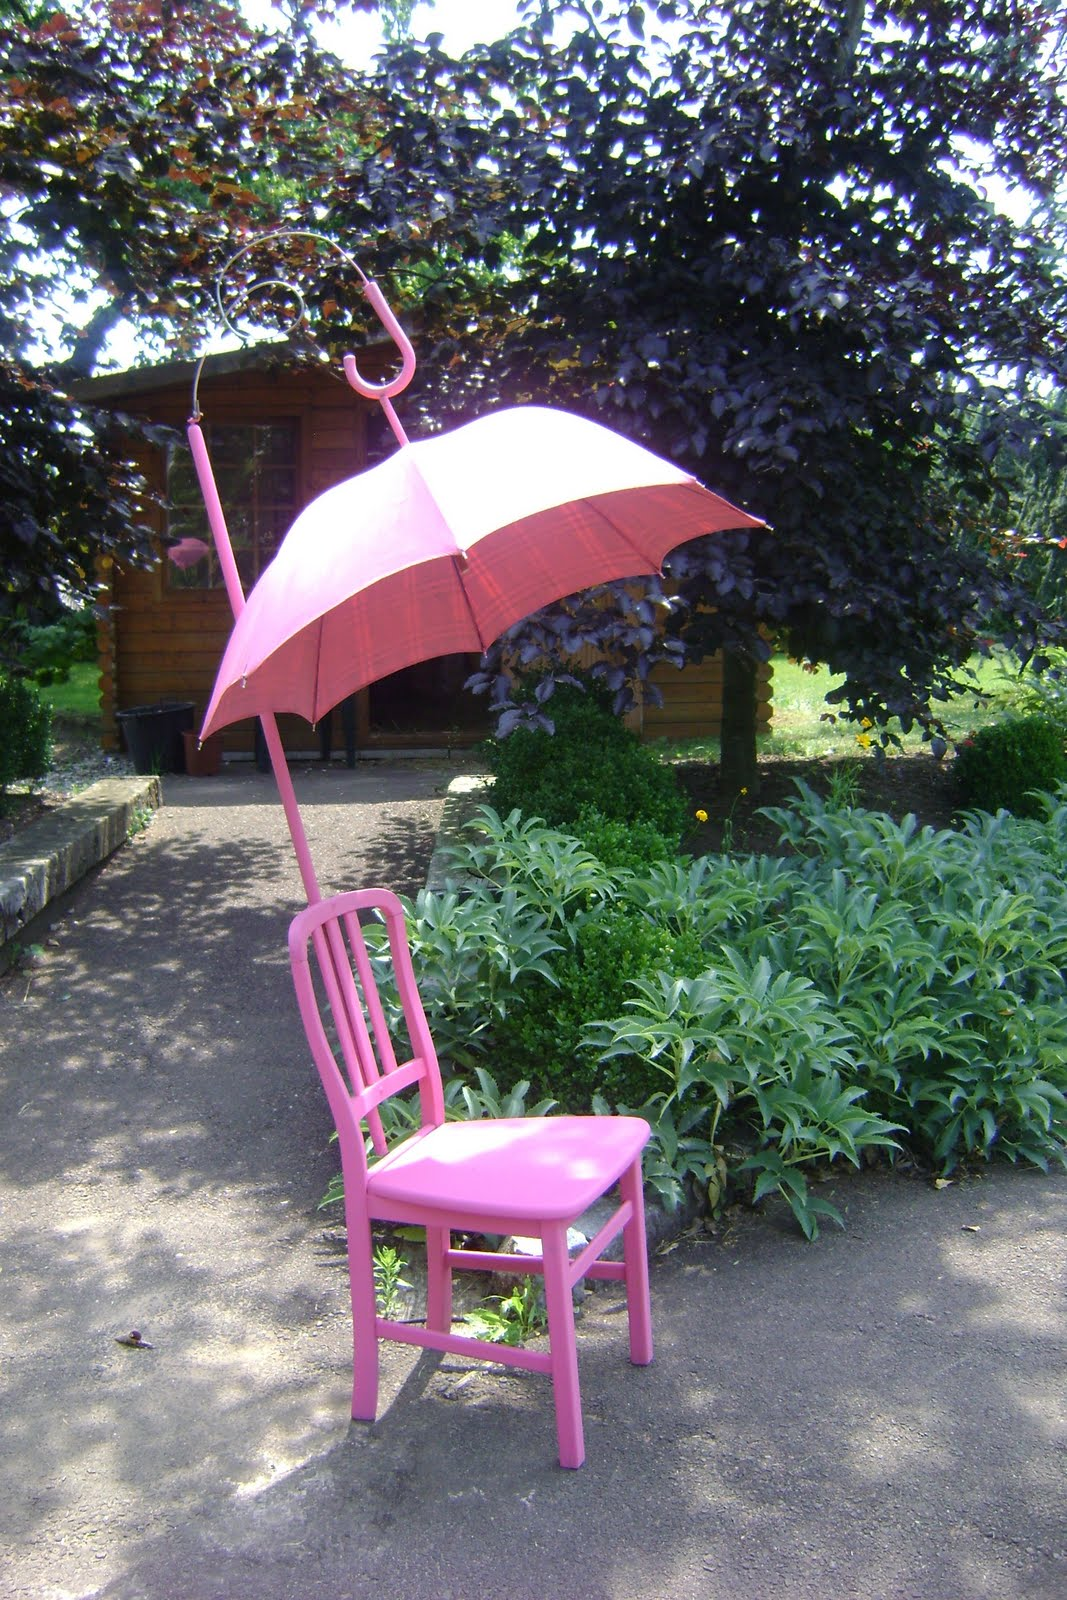 les ateliers du remue m nage cr ation r cup ration expression hils virginie jardin sensoriel. Black Bedroom Furniture Sets. Home Design Ideas